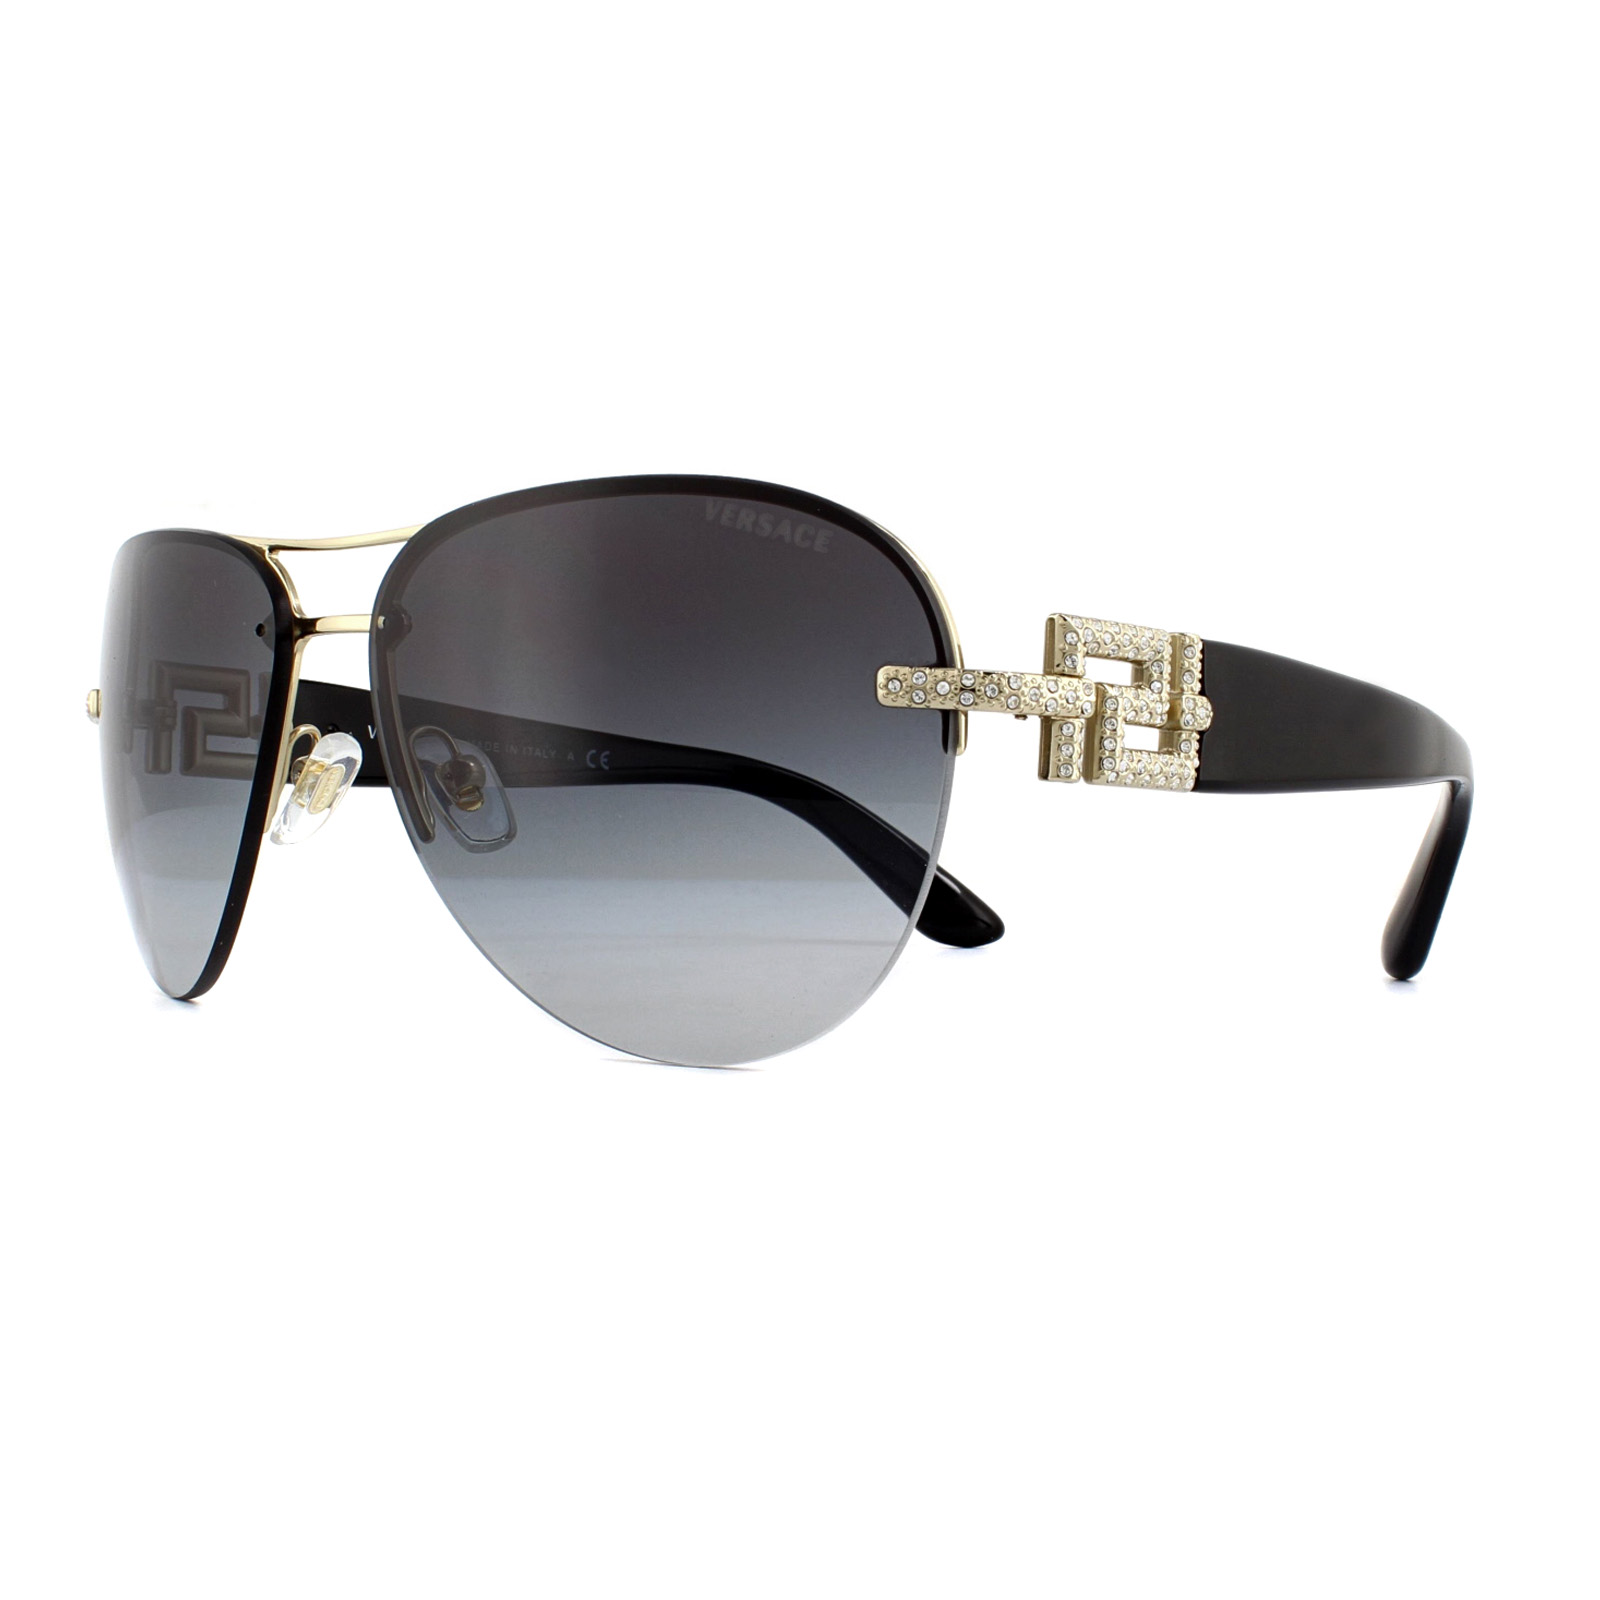 780d01fb02bf2 Sentinel Versace Sunglasses VE2159B 12528G Black   Gold Grey Gradient